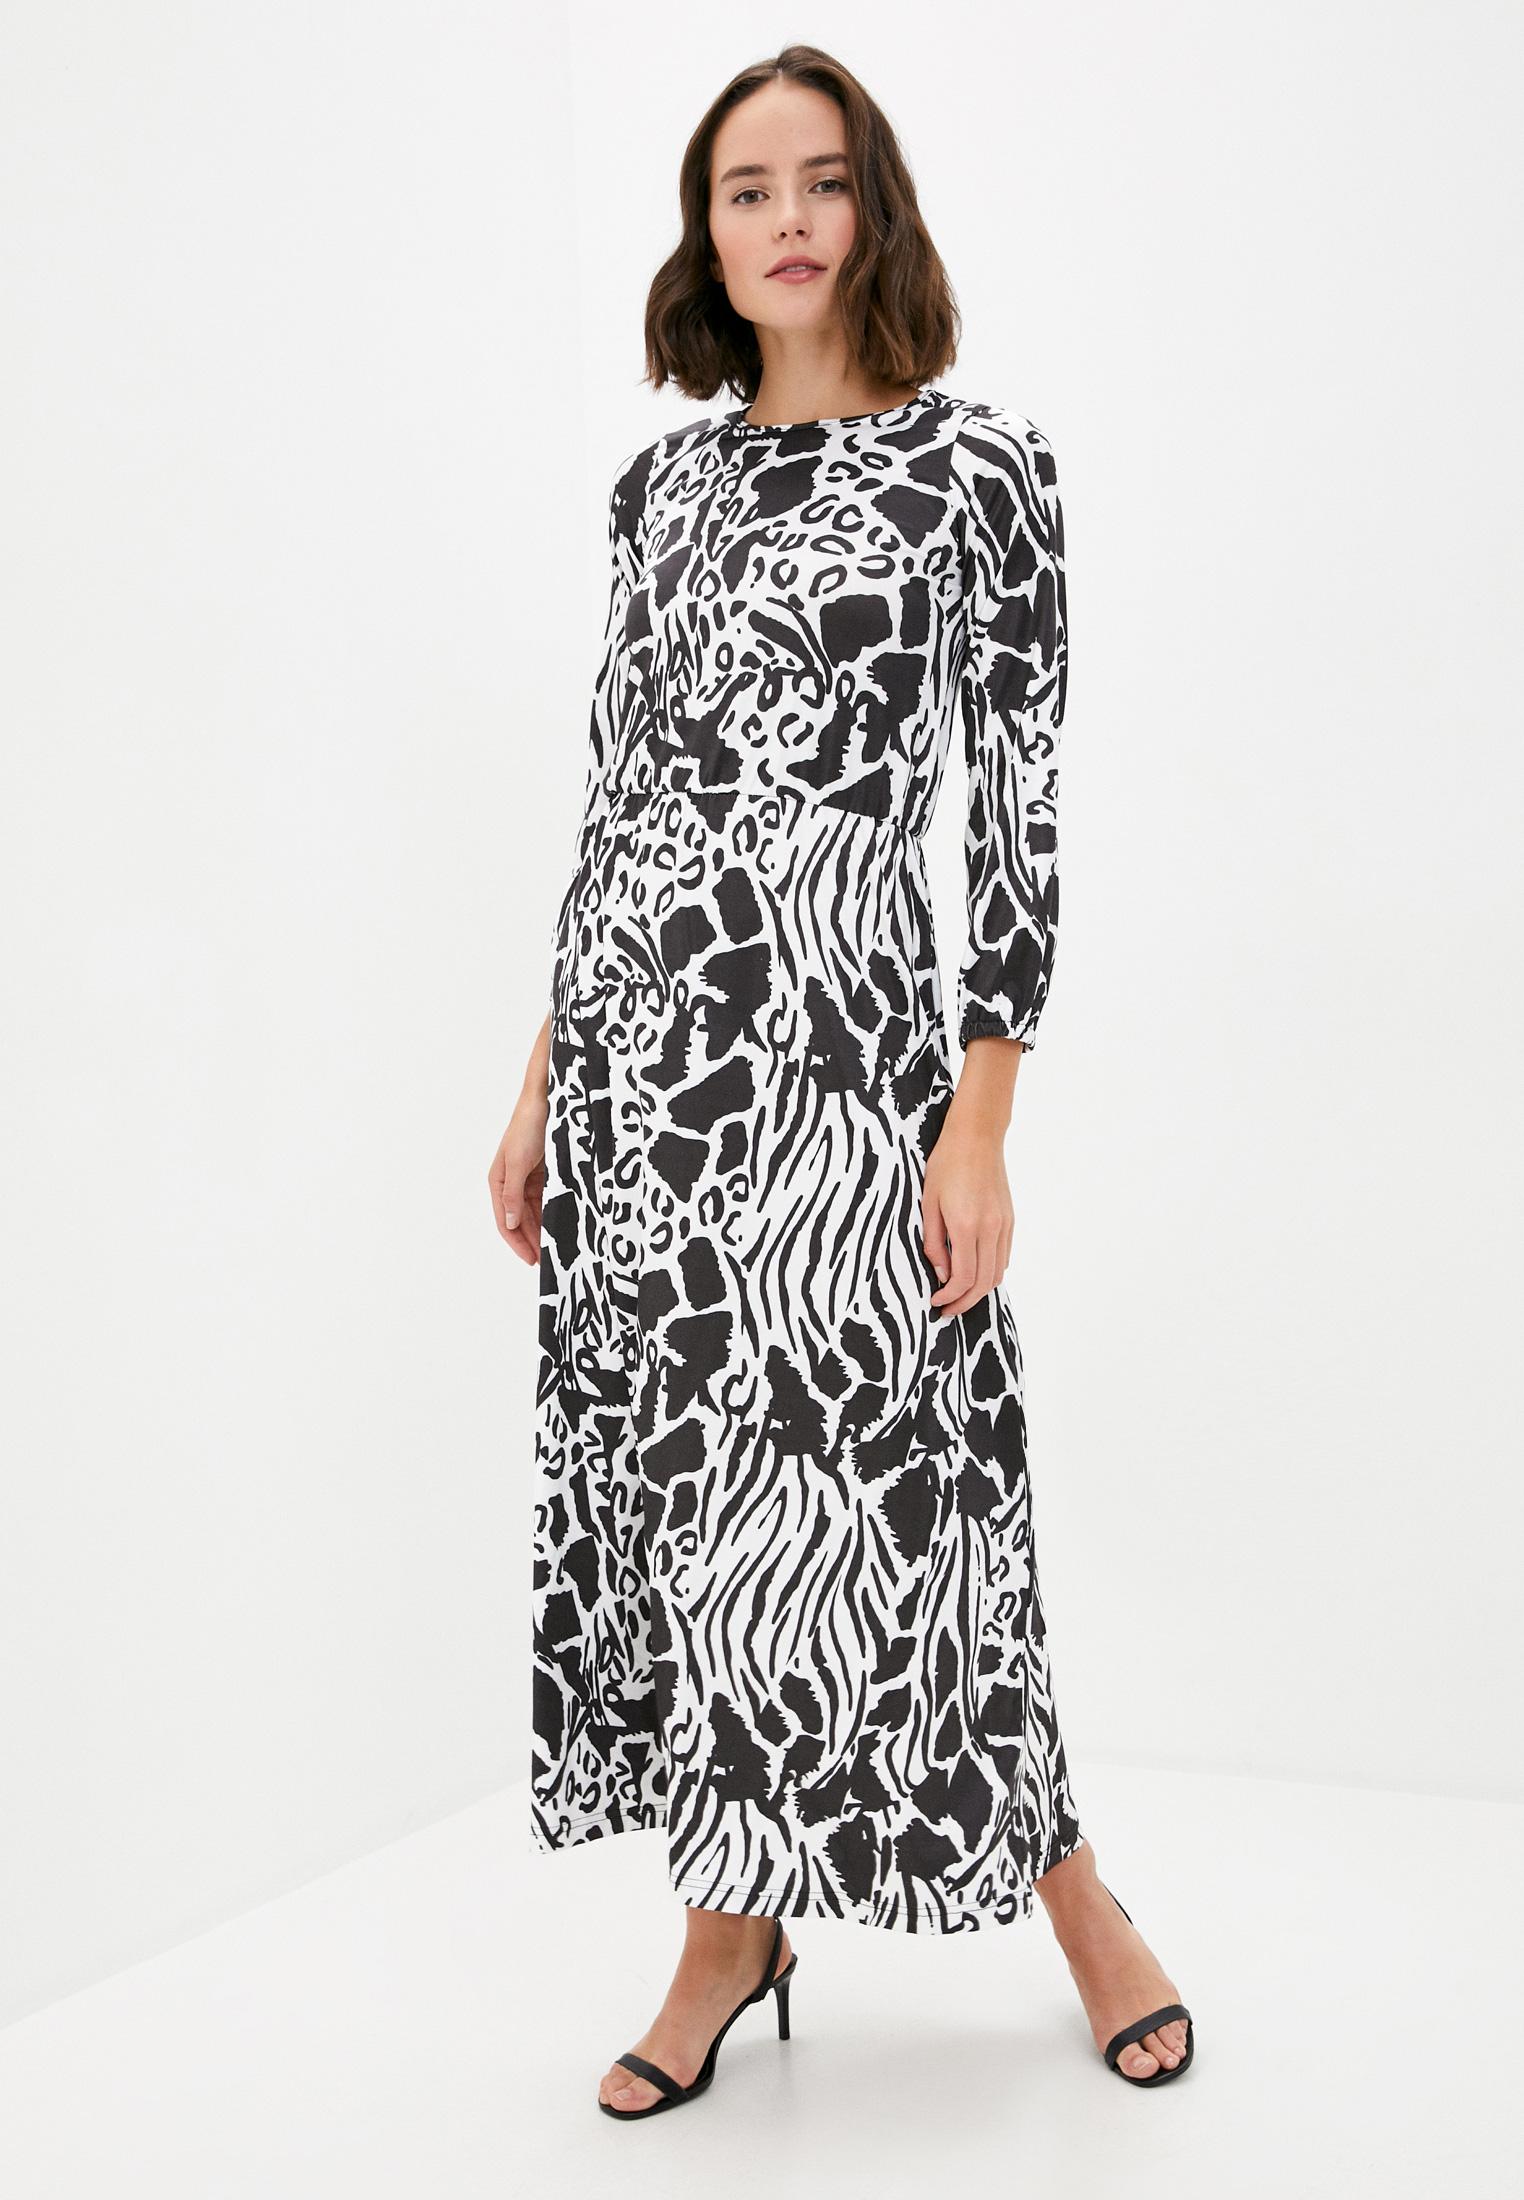 Платье A-A Awesome Apparel by Ksenia Avakyan купить за 1 378 ₽ в интернет-магазине Lamoda.ru